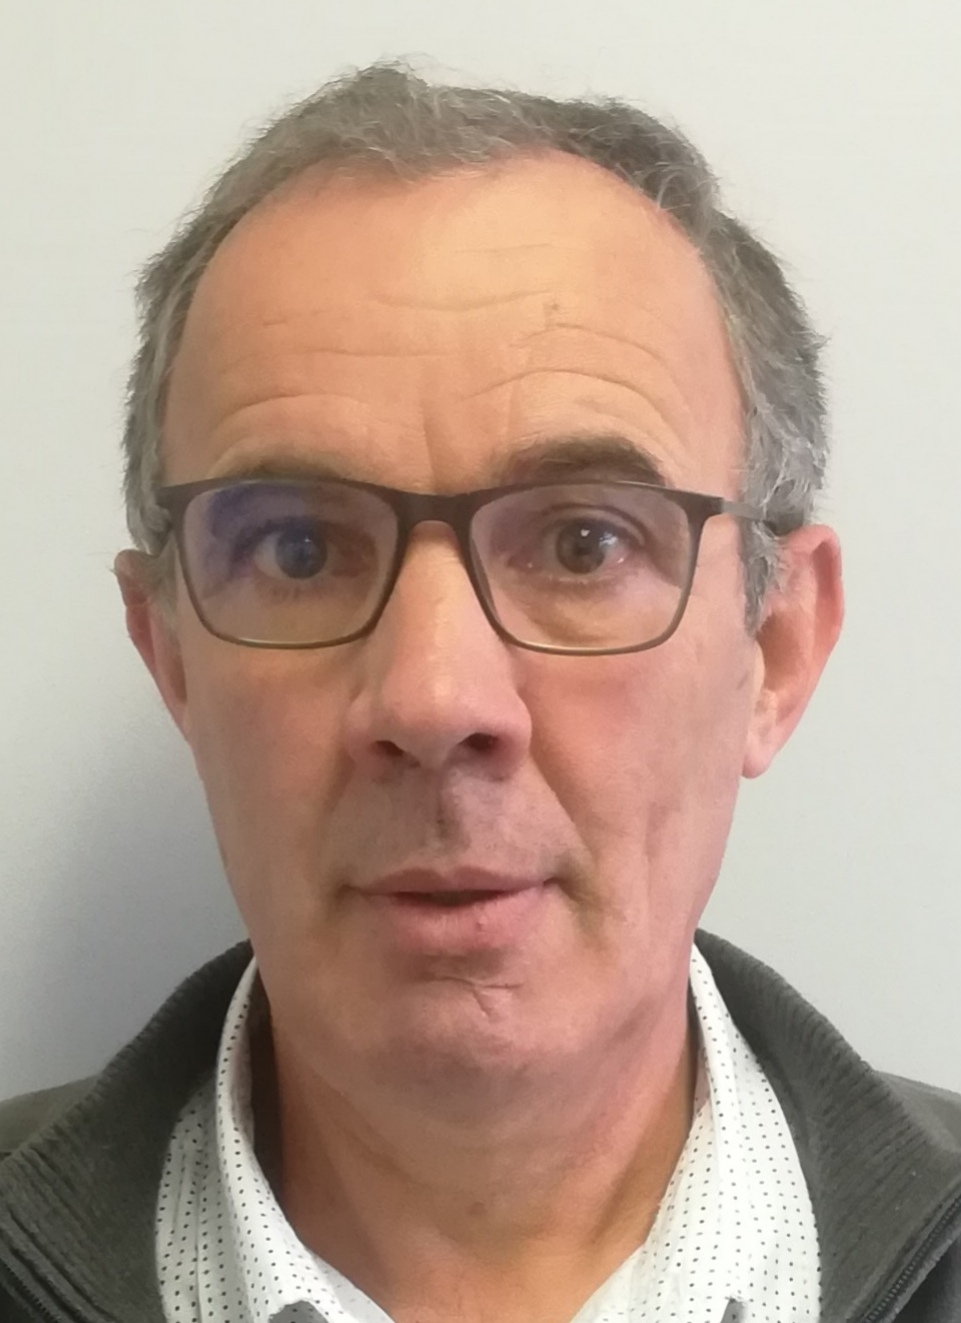 Monsieur le Maire Alain VIOULAC